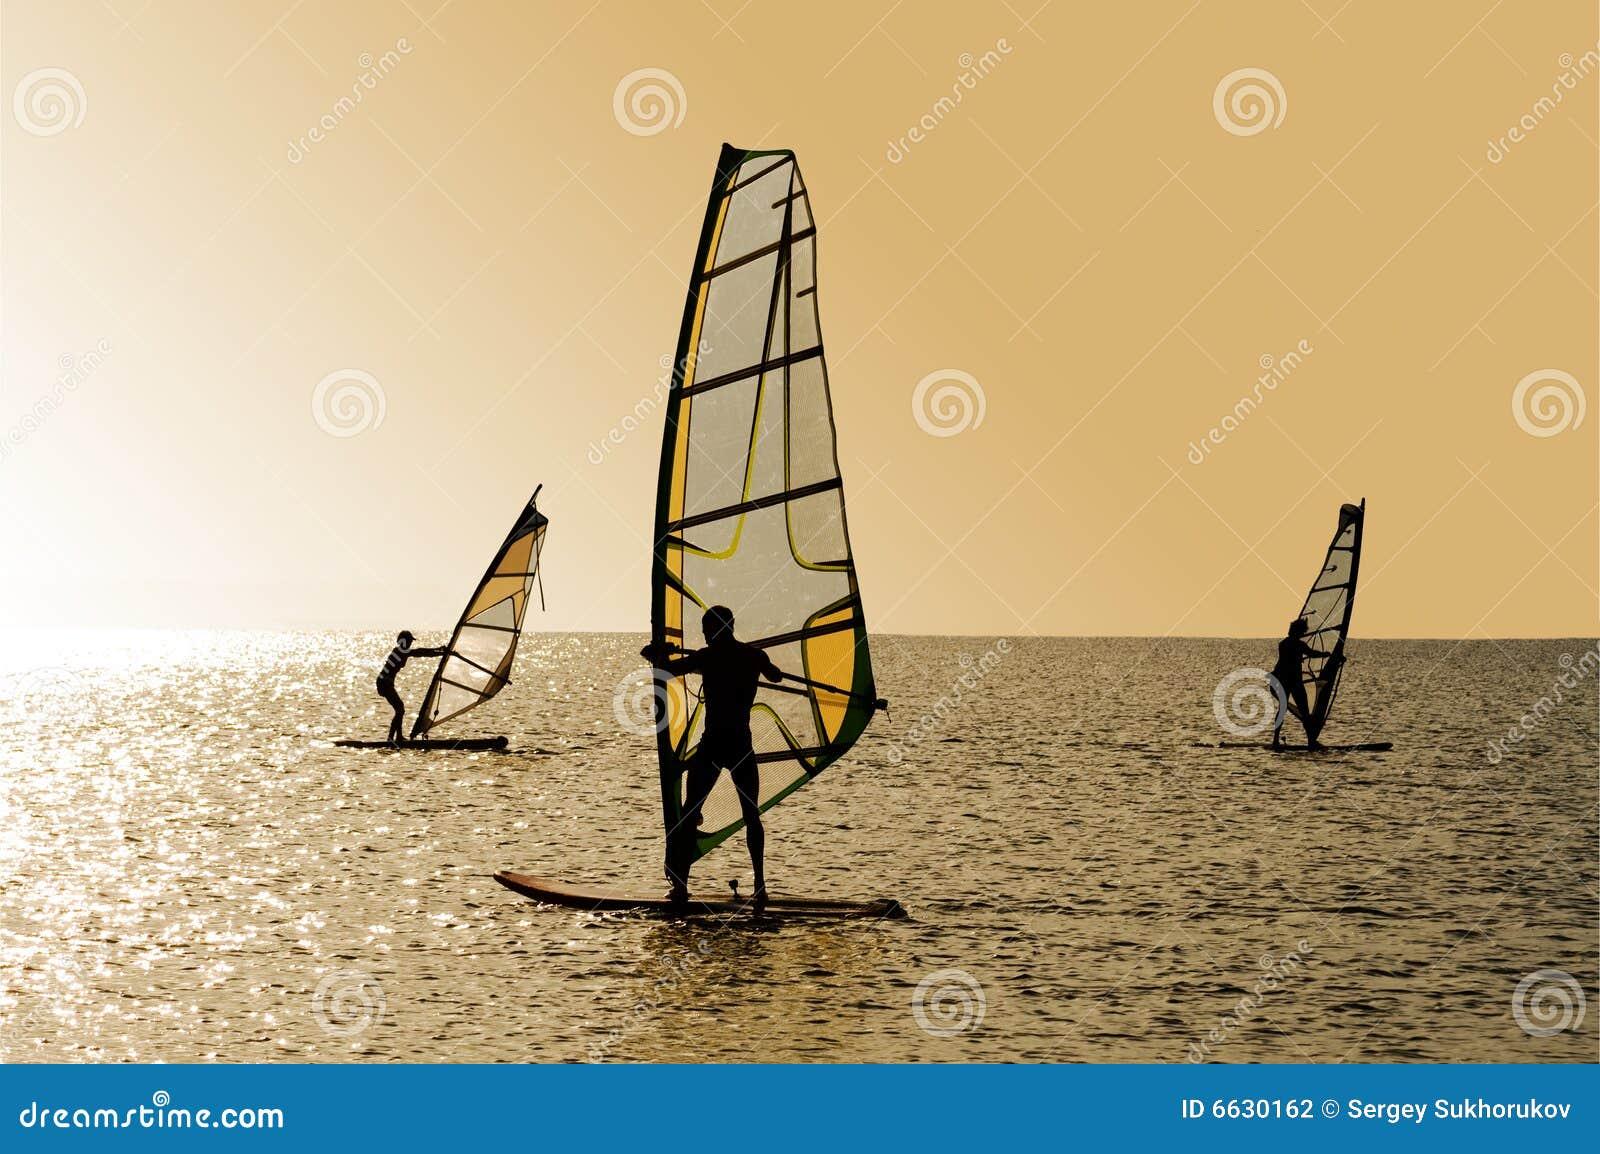 Silhouettes of windsurfers